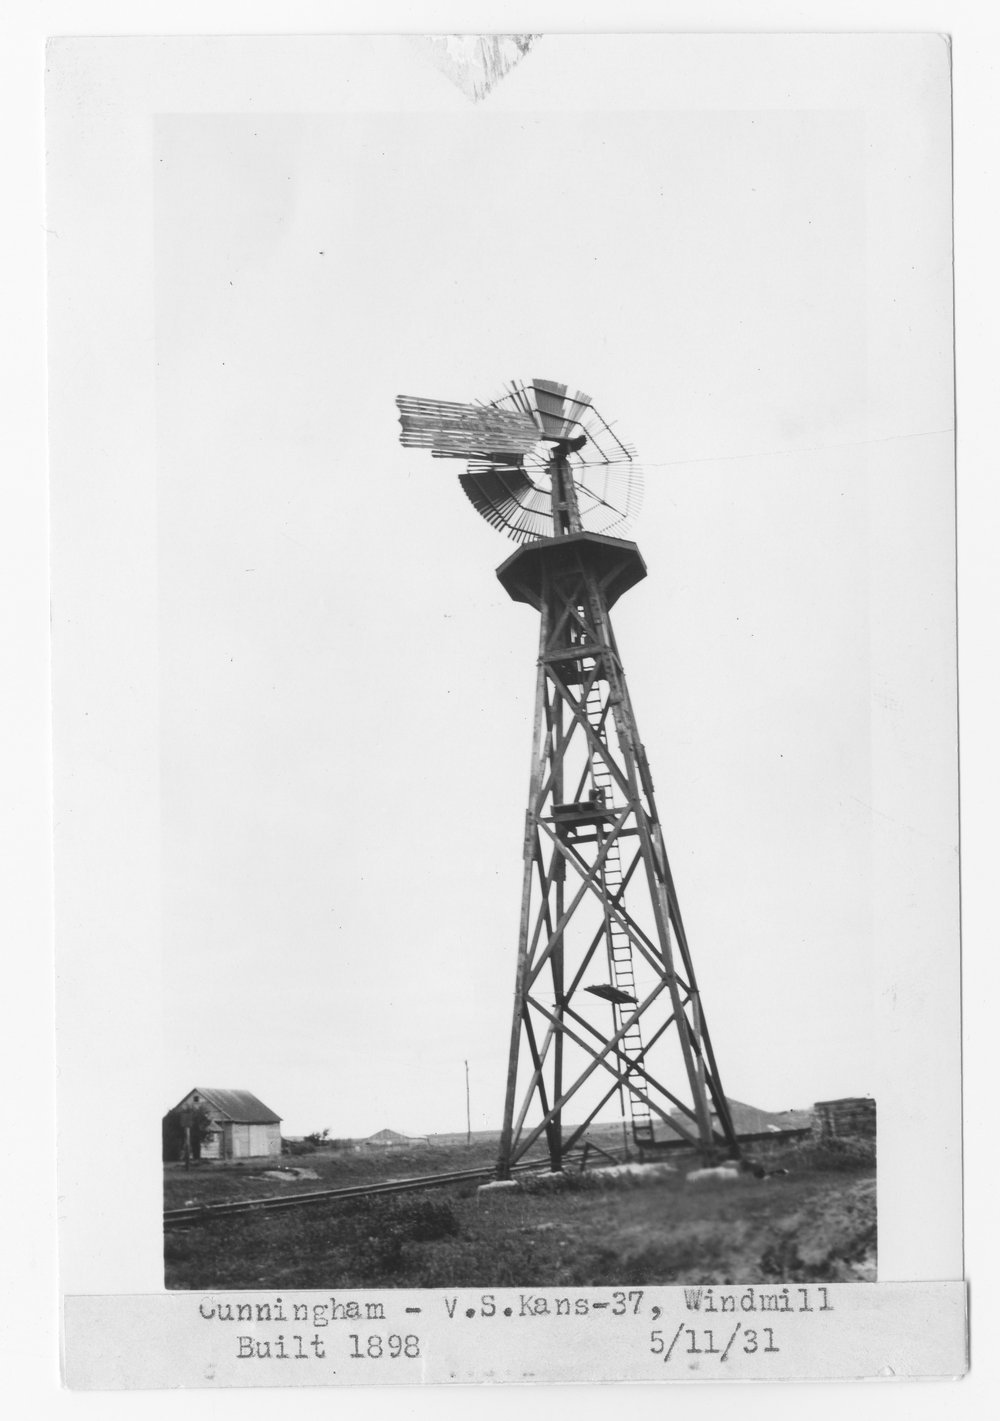 Atchison, Topeka & Santa Fe Railway Company windmill, Cunningham, Kansas